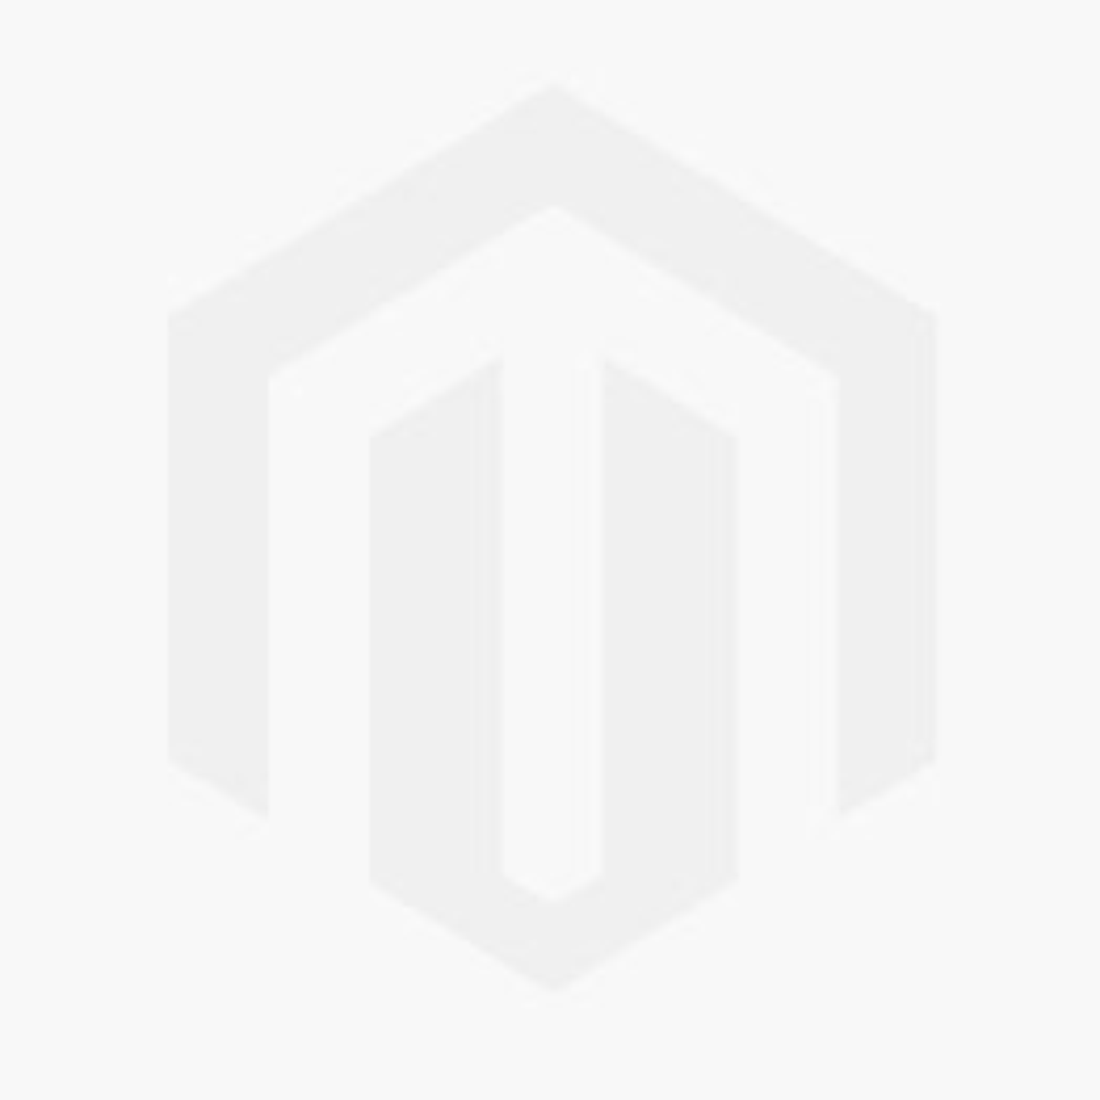 Calder Exhibition Poster, 1992